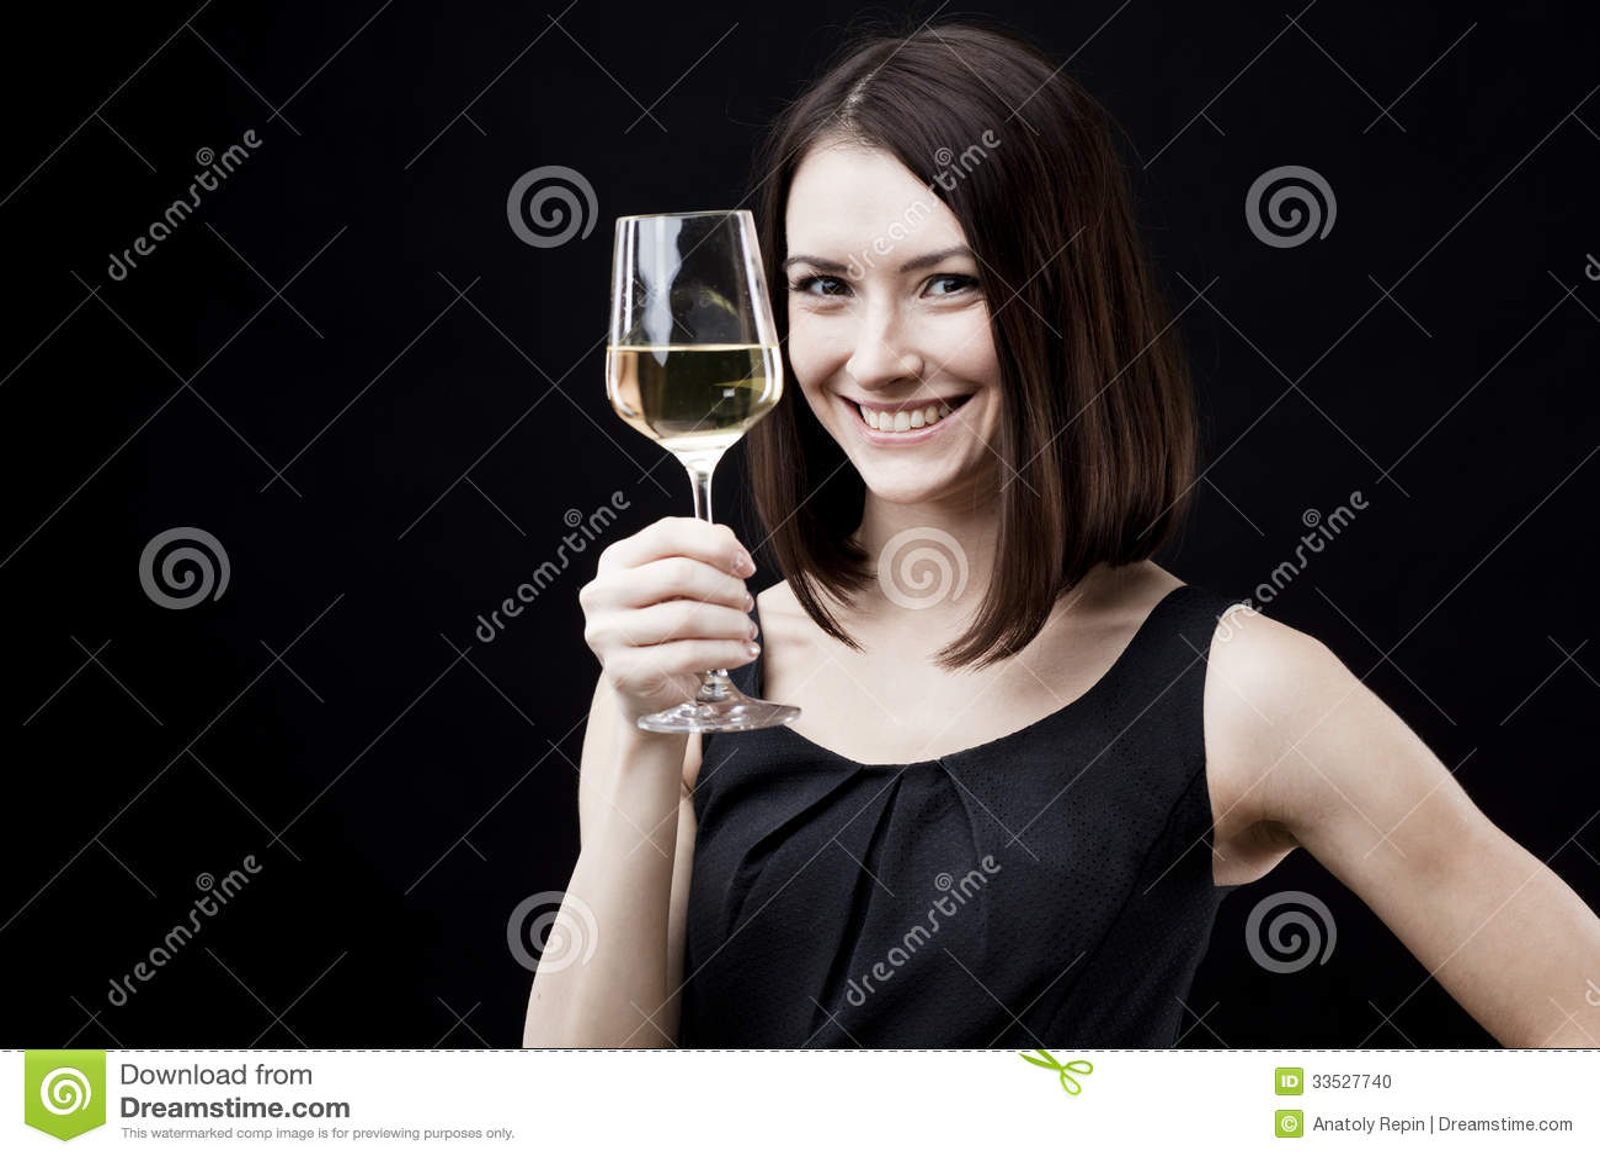 Woman Holding Wine Glass Stock Photo - Image: 33527740